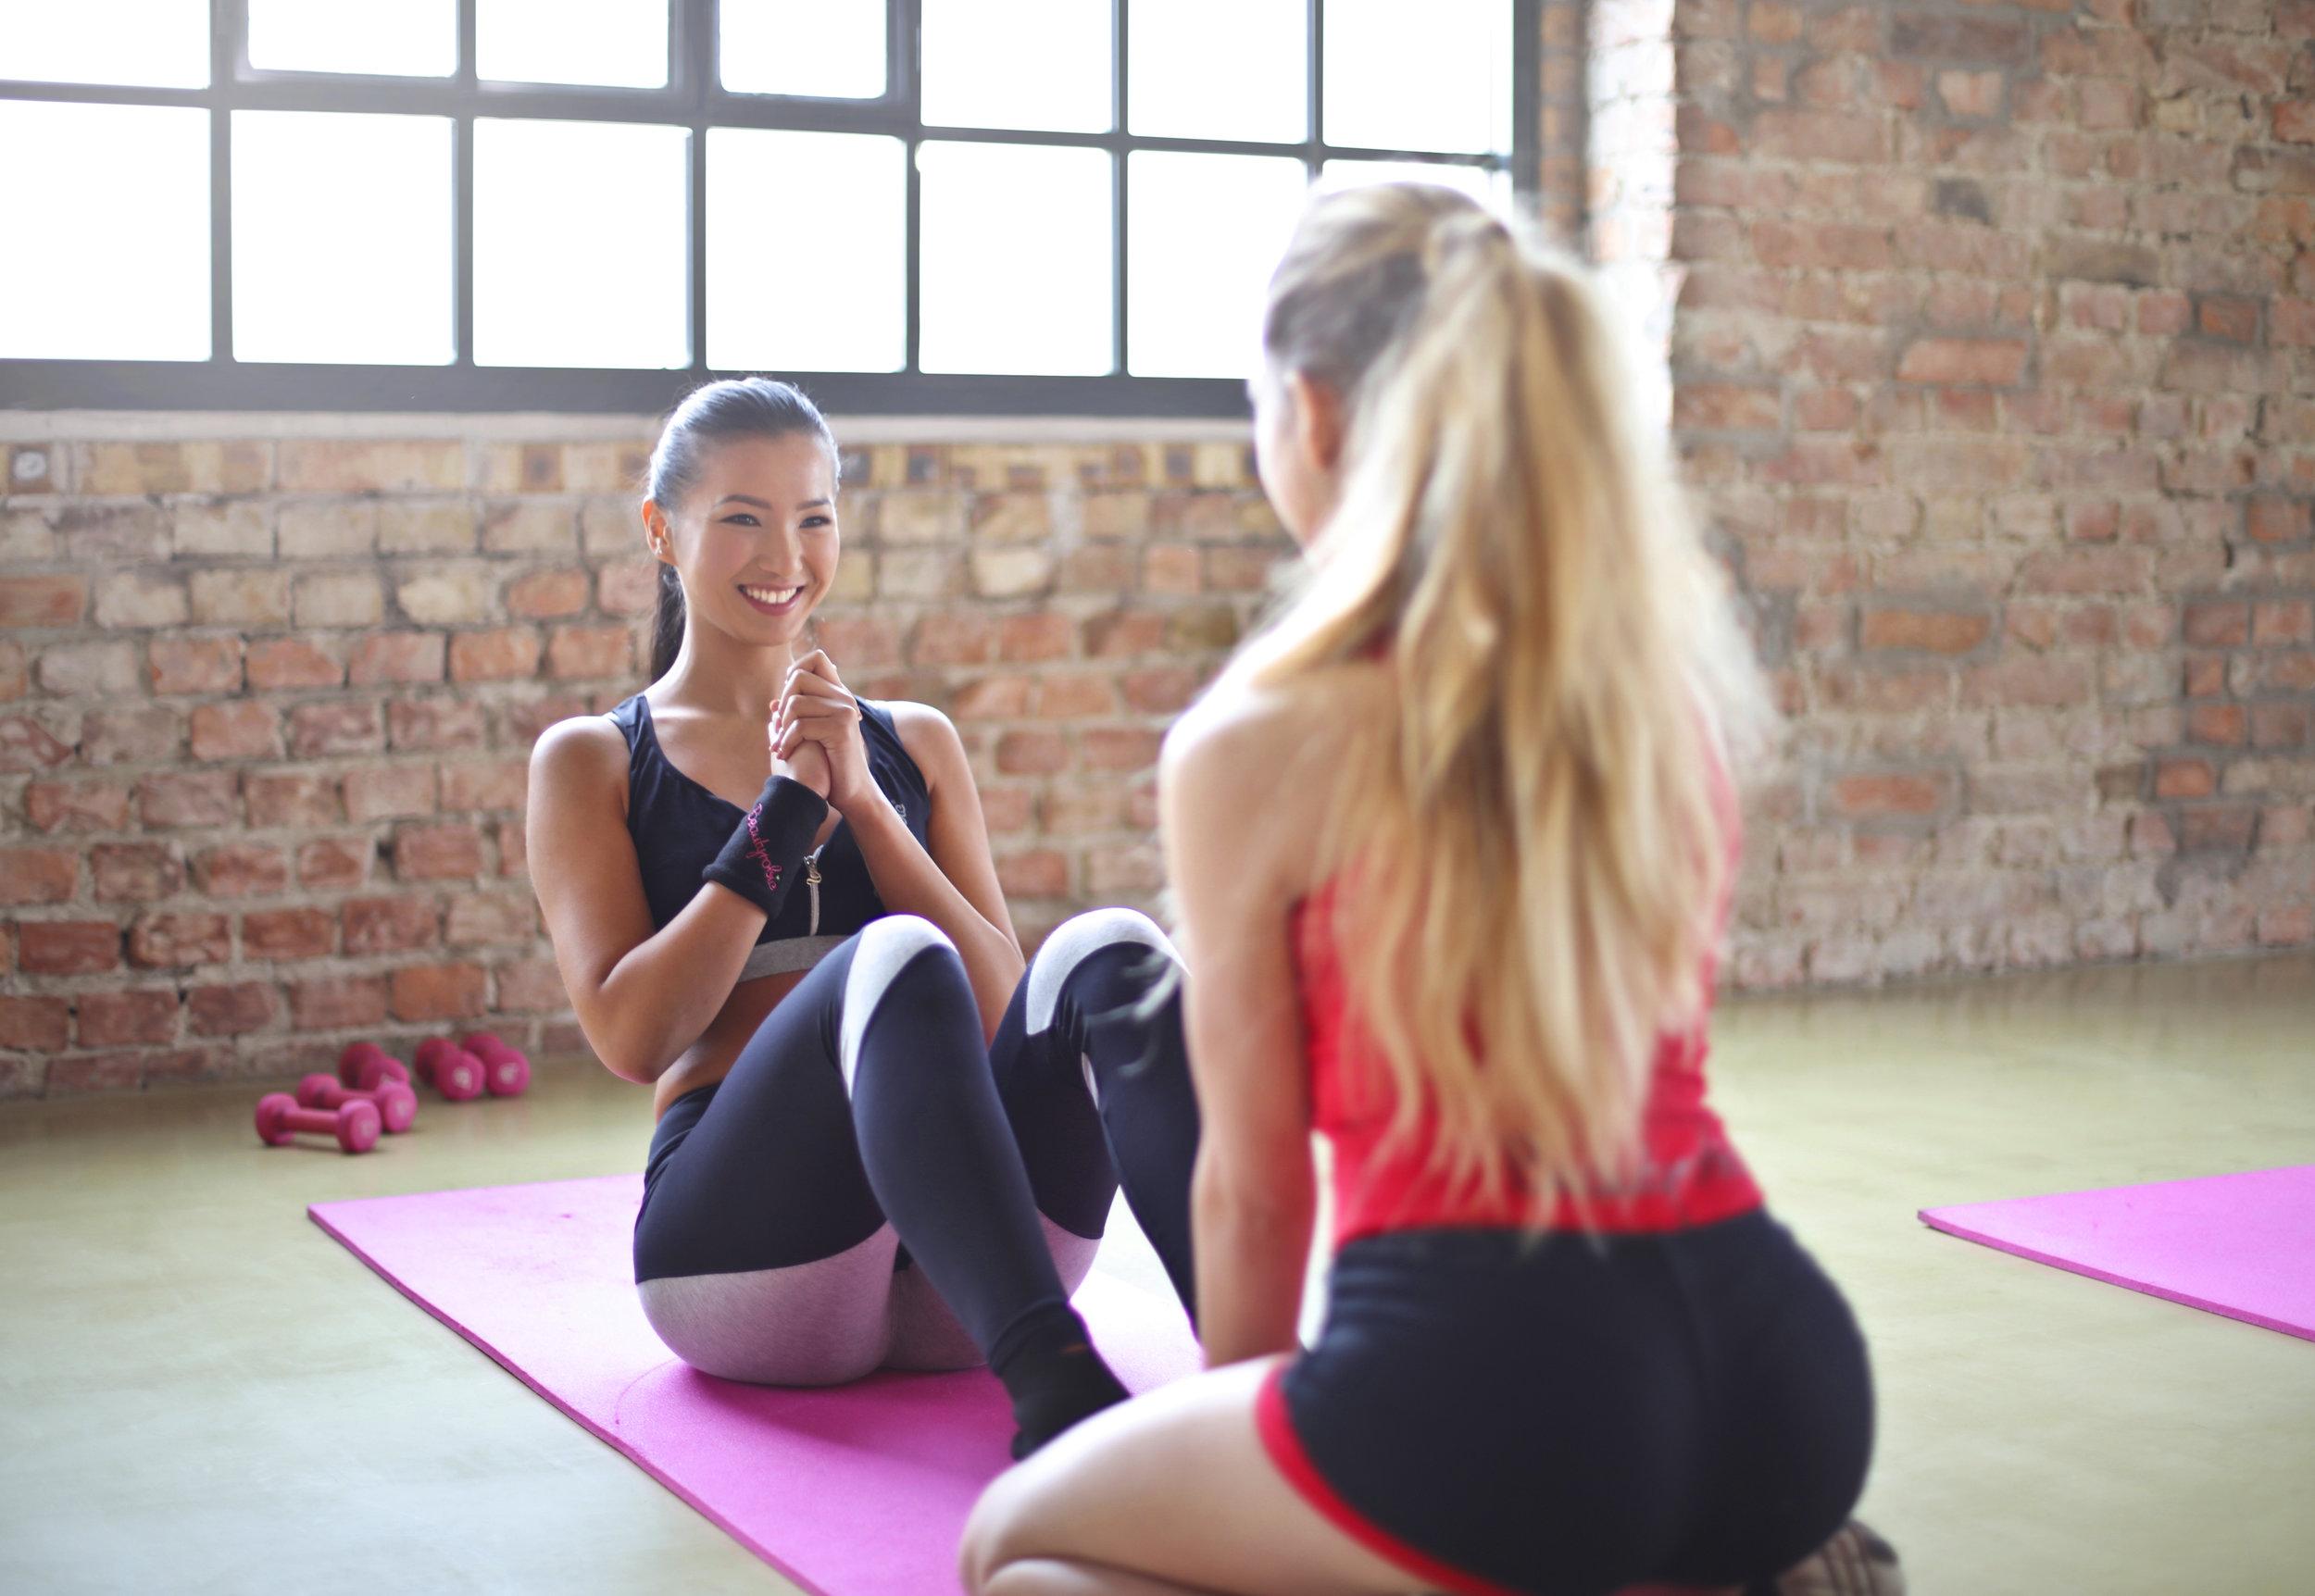 gender fitness travel health wellness